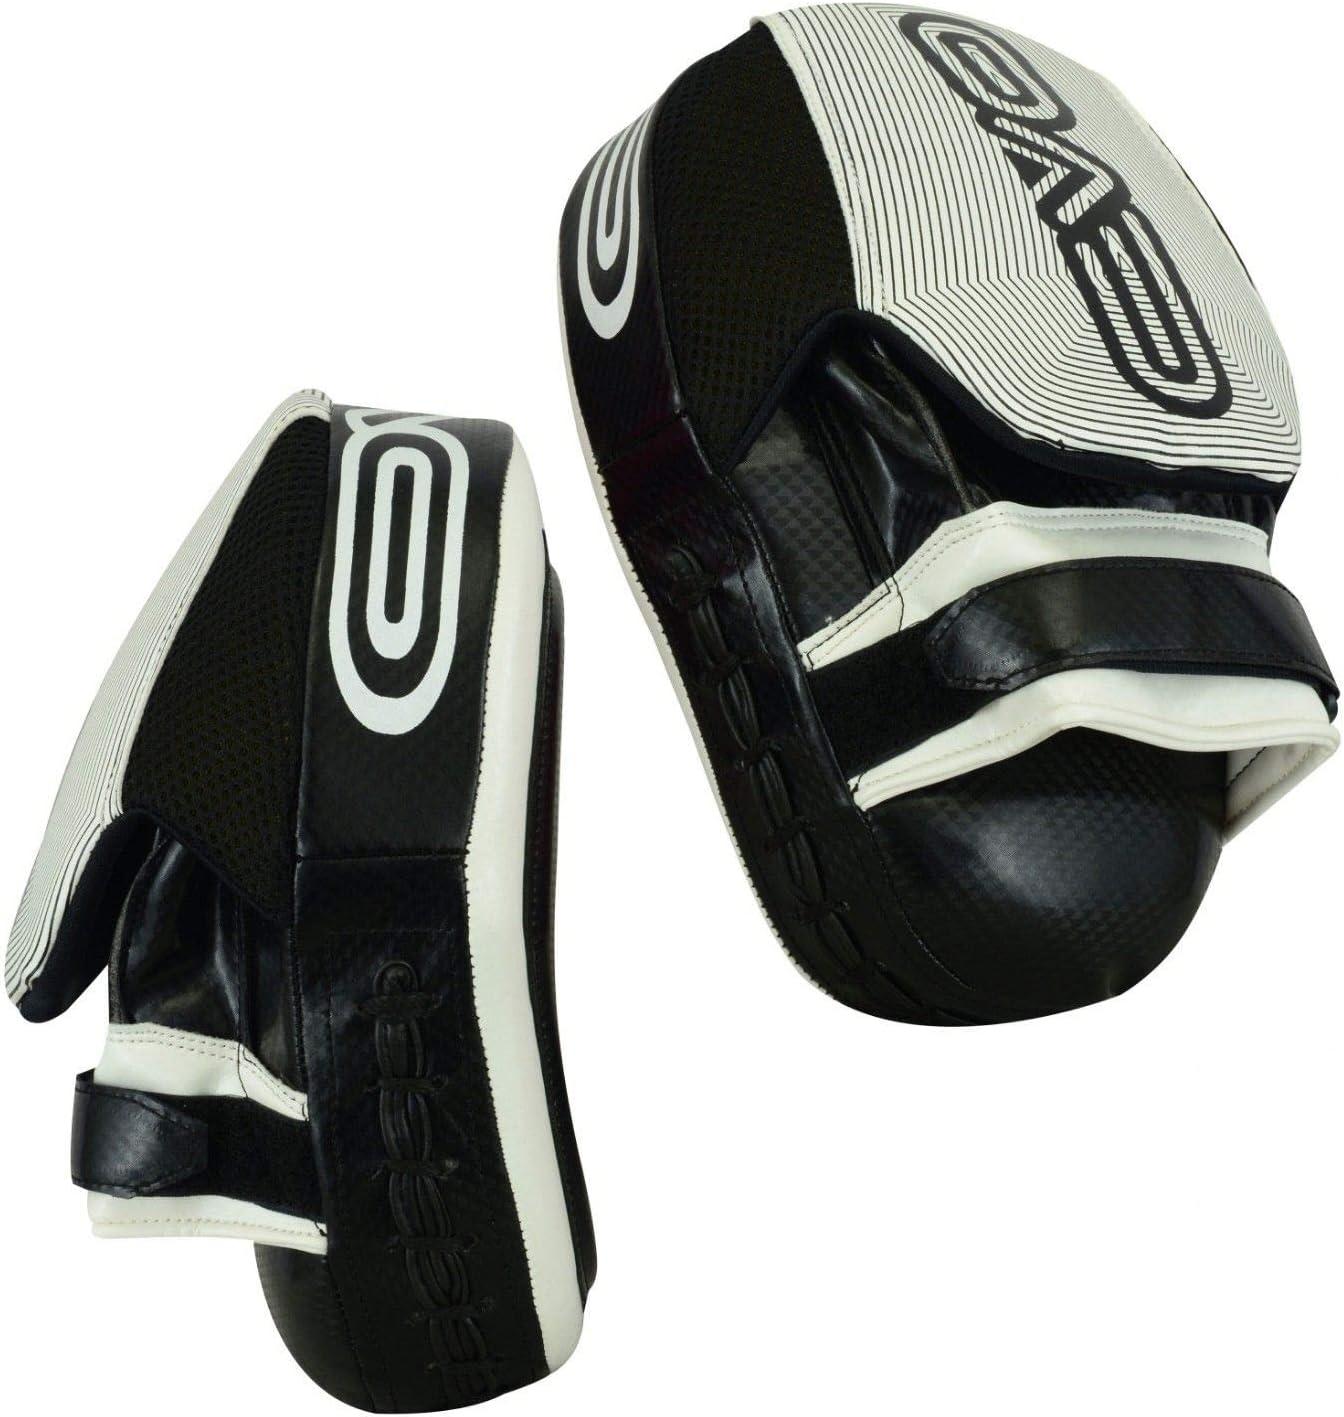 EVO Fitness Boxen MMA Focus Pads Muay Thai Kampfsport Training Pad UFC PRO